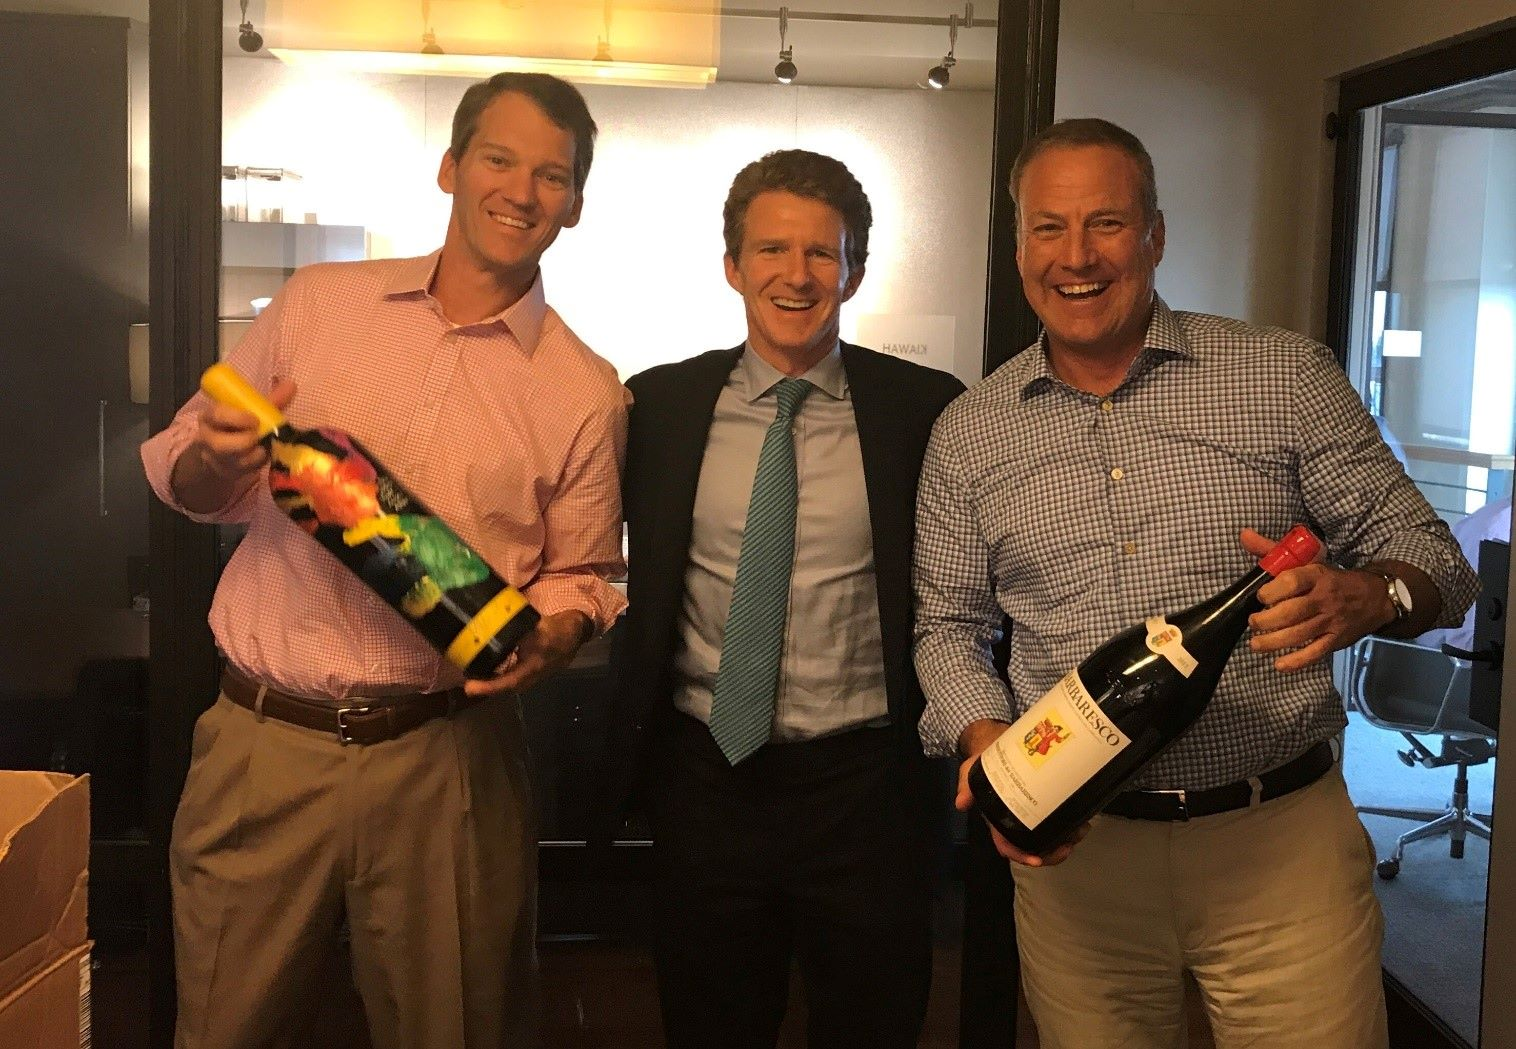 Greystar leadership team celebrate at the office